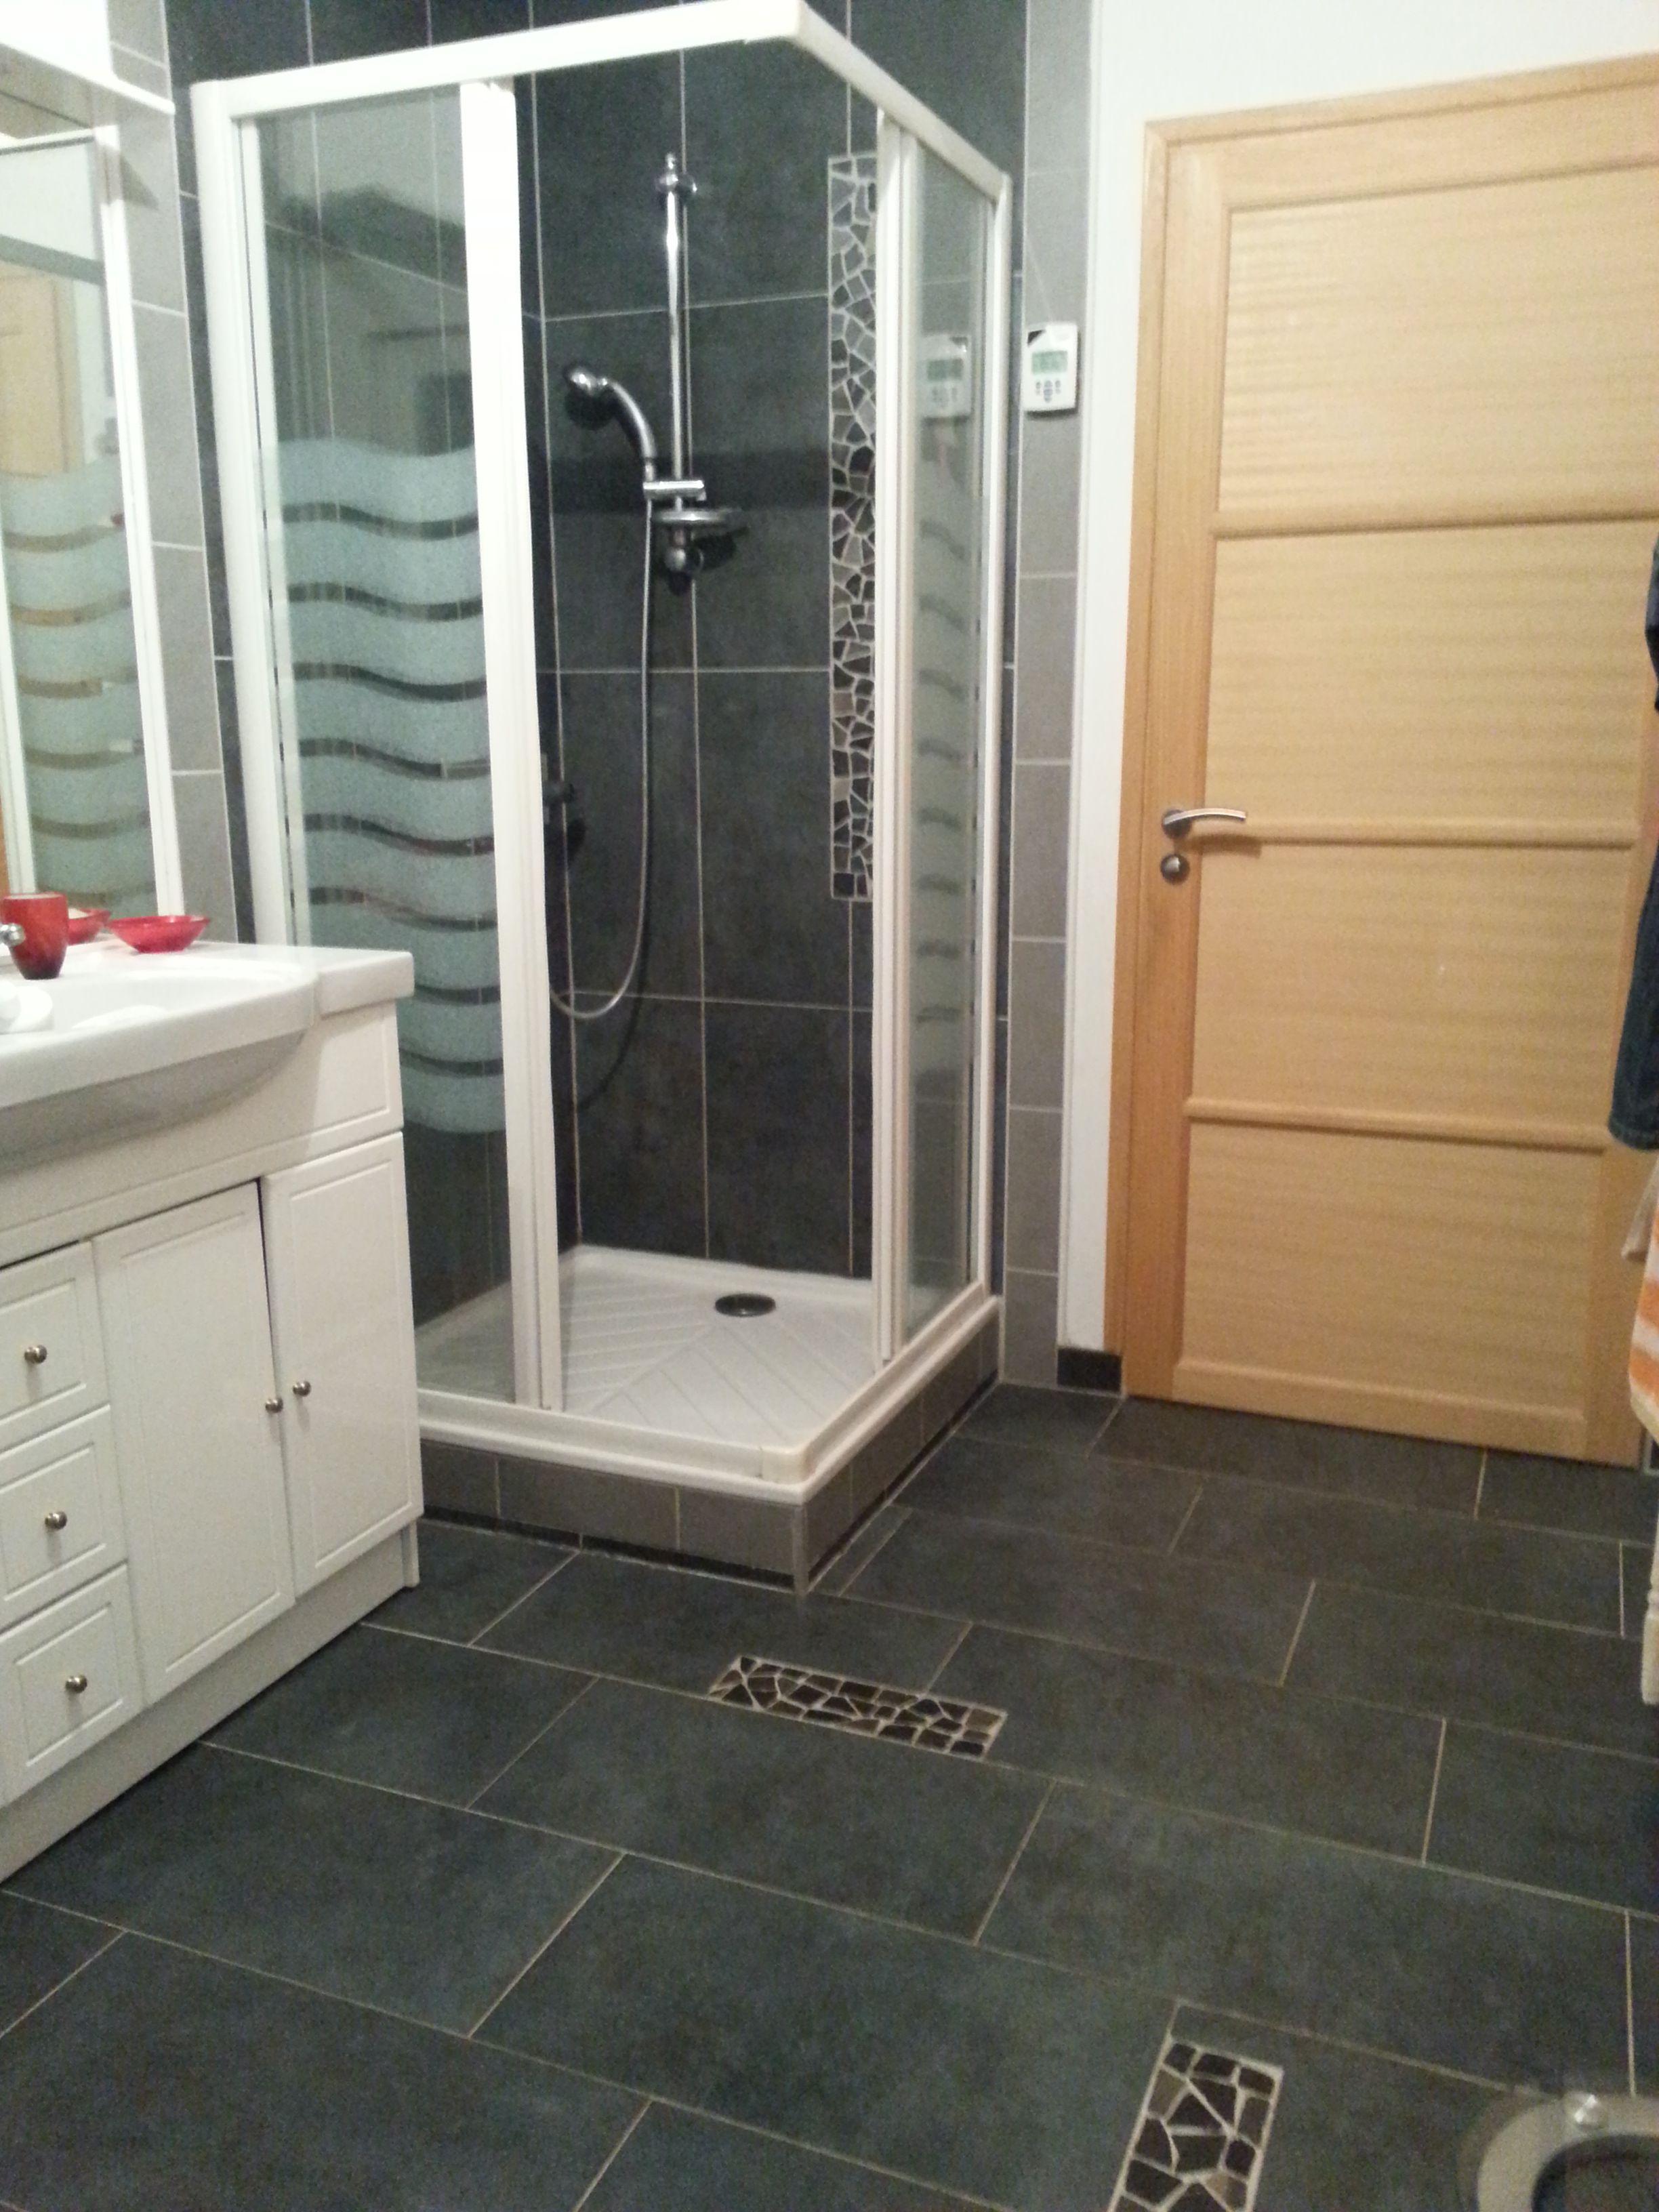 Une Douche De Coin Http Espritcarrelage Com Bathtub Home Decor Alcove Bathtub